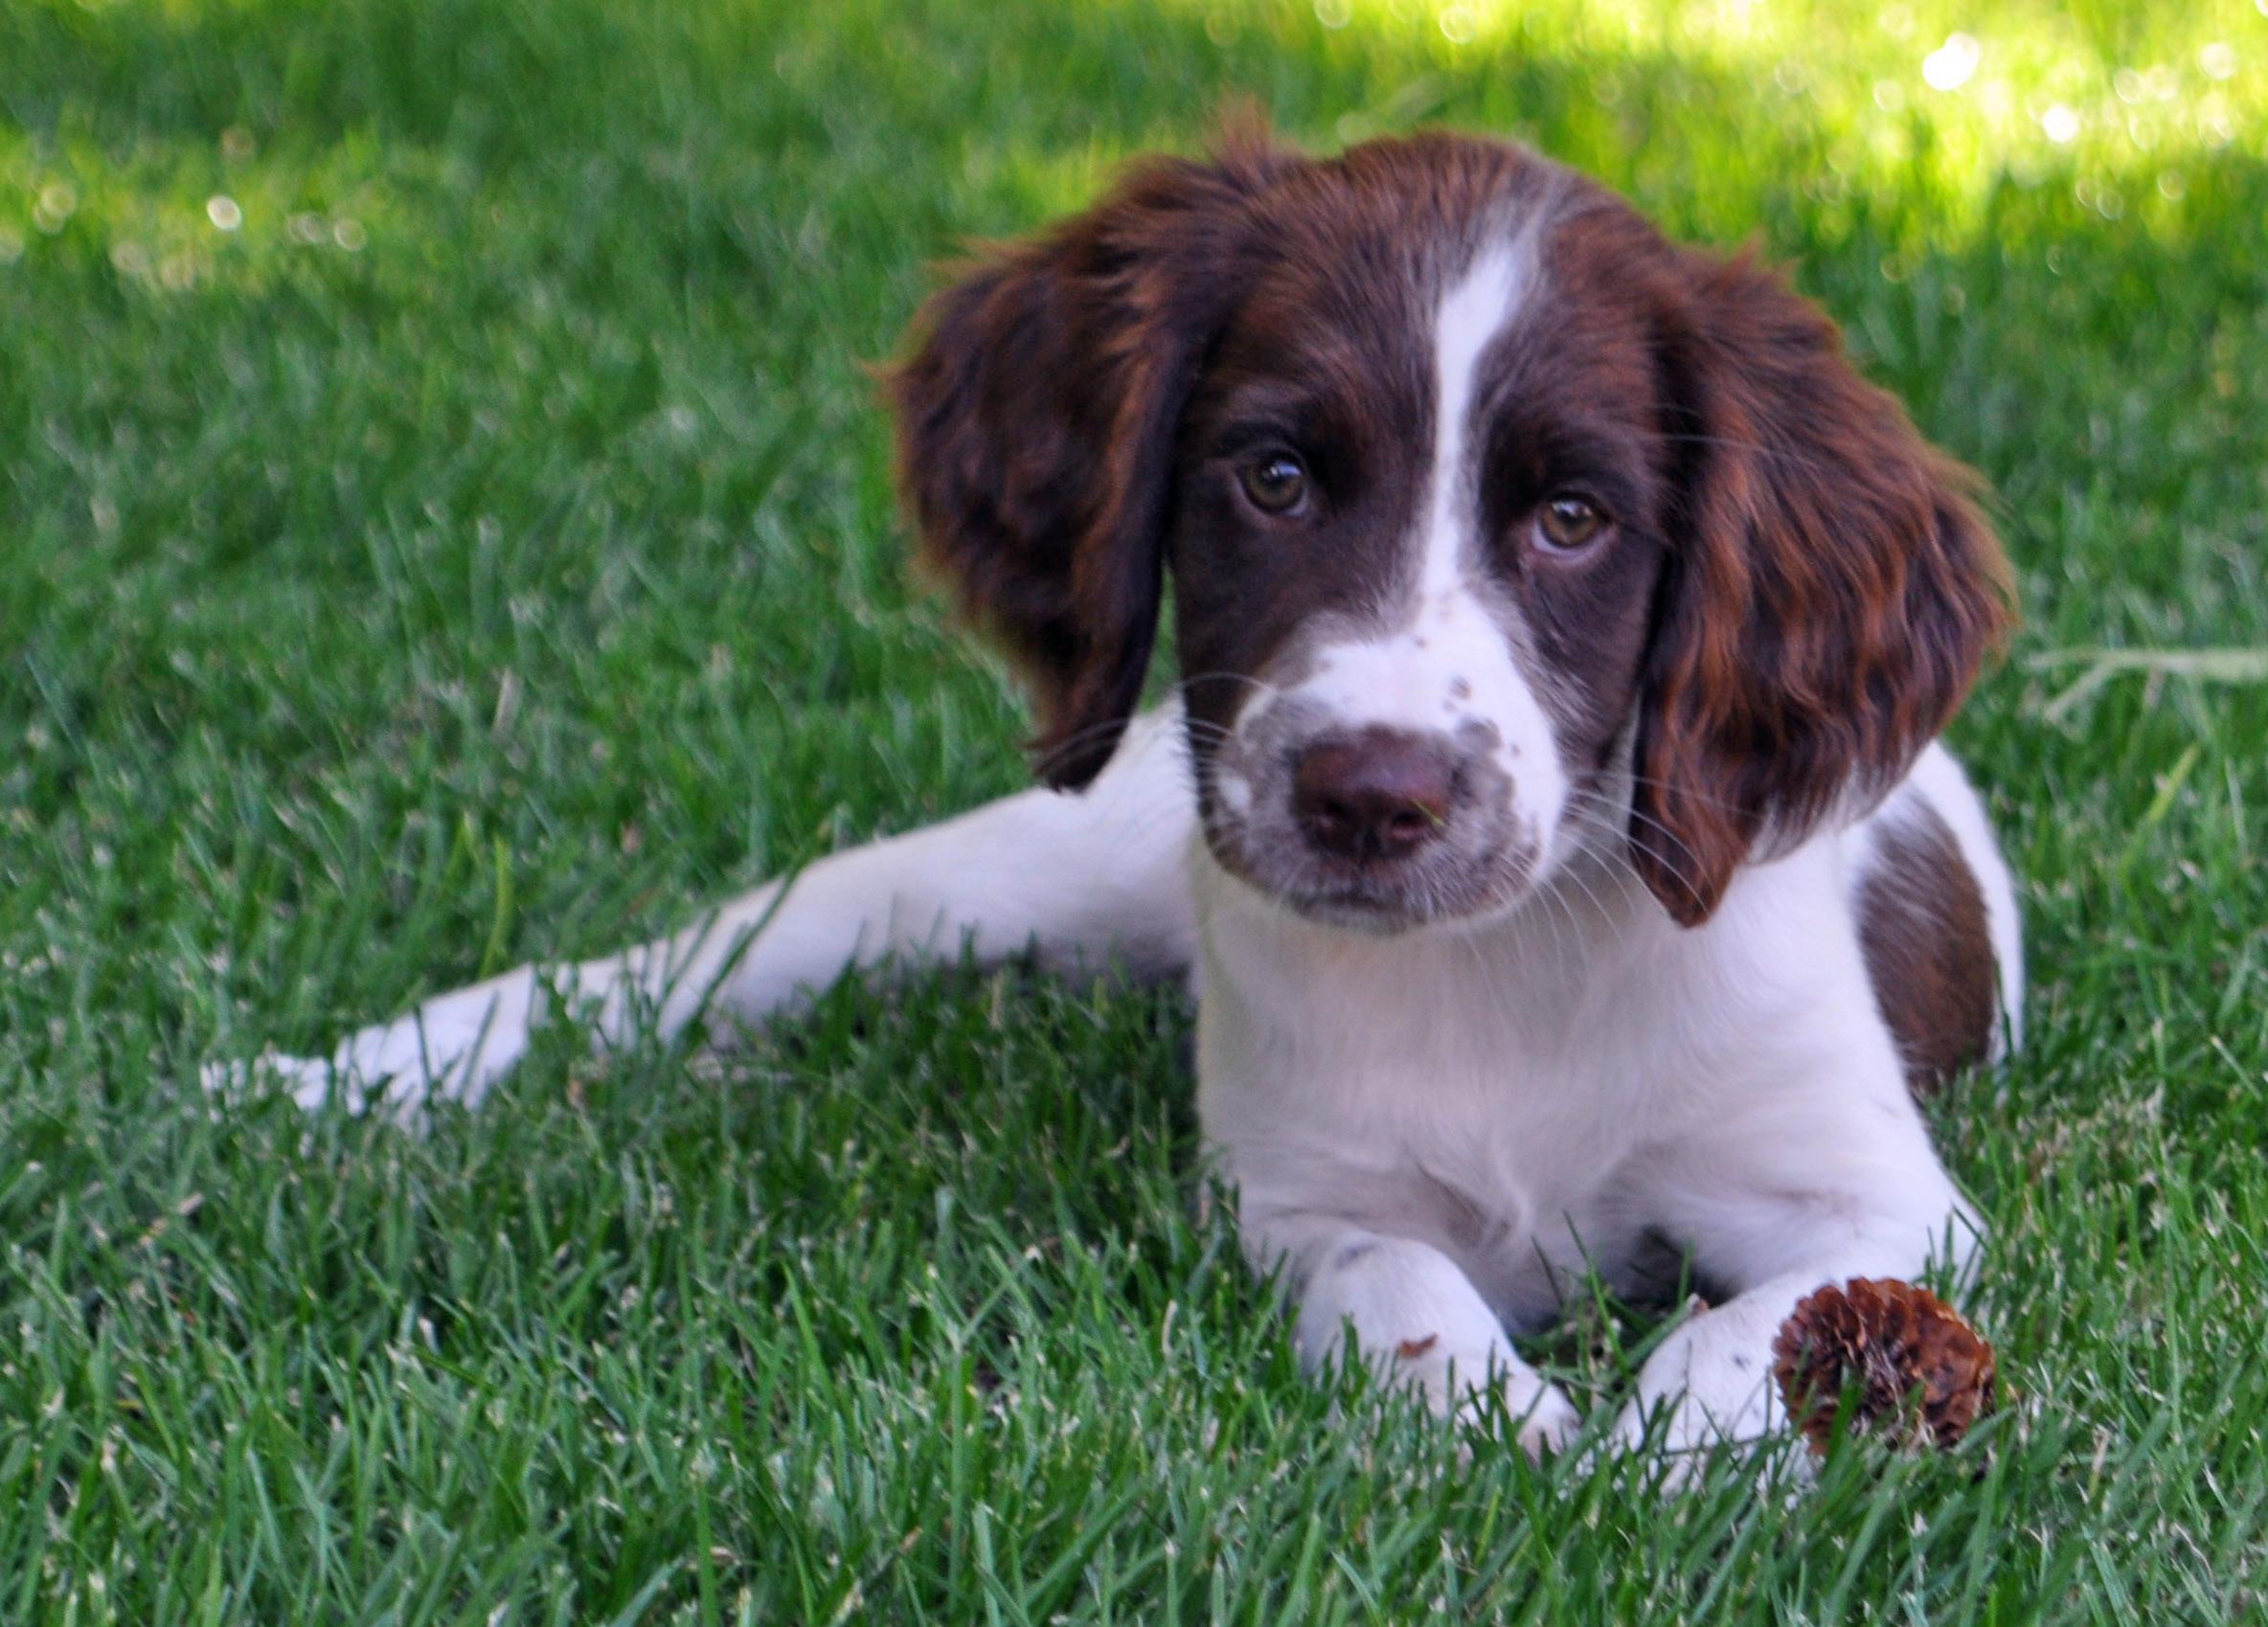 Drentse Patrijshond Puppies: Drentse Drentse Patrijshond Puppies For Sale Uk Gallery Breed